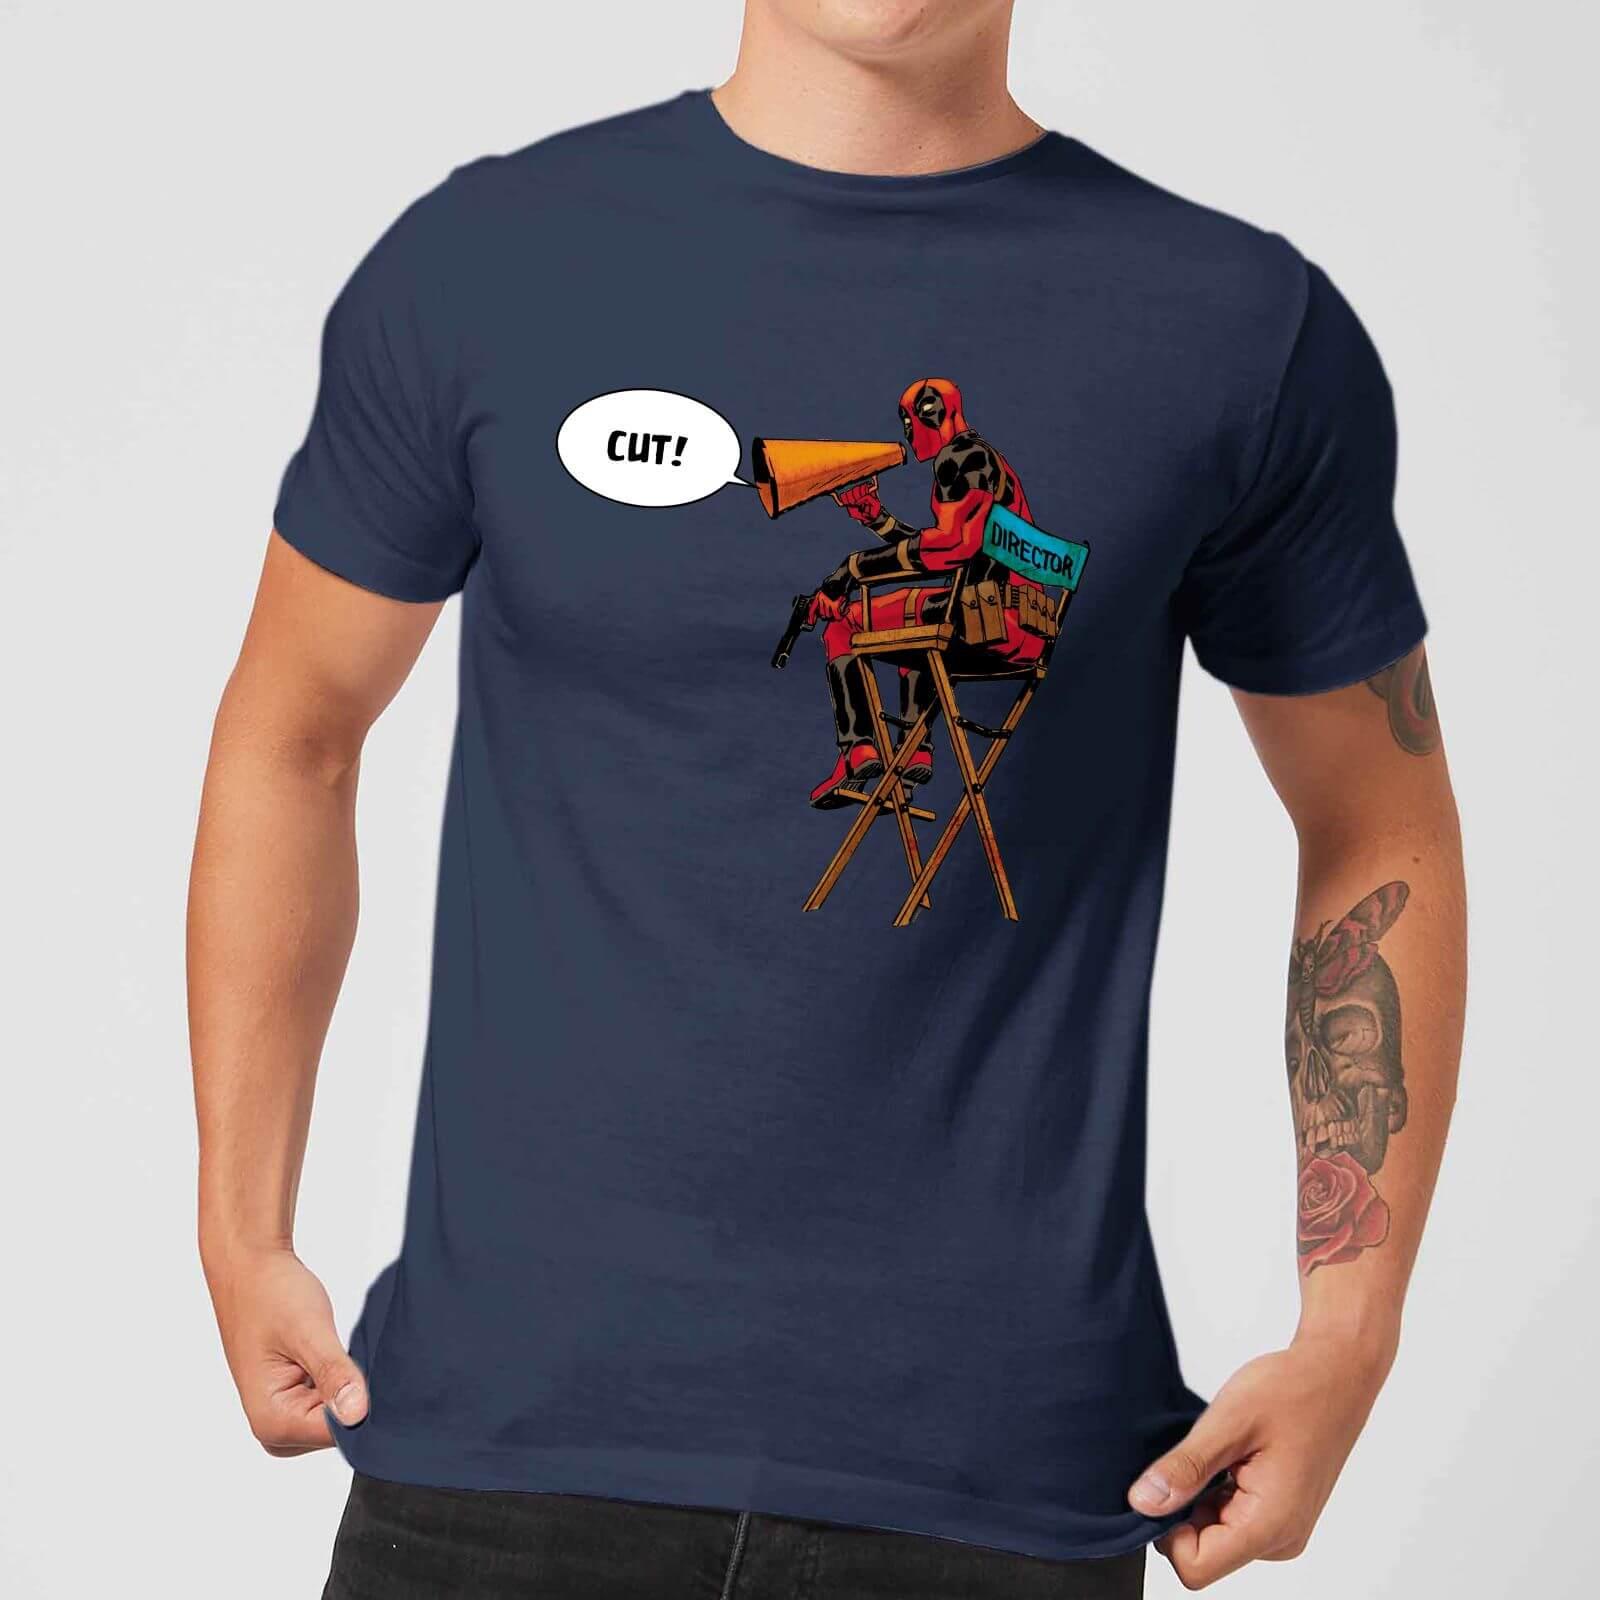 OfferteWeb.click 17-t-shirt-marvel-deadpool-director-cut-navy-uomo-xxl